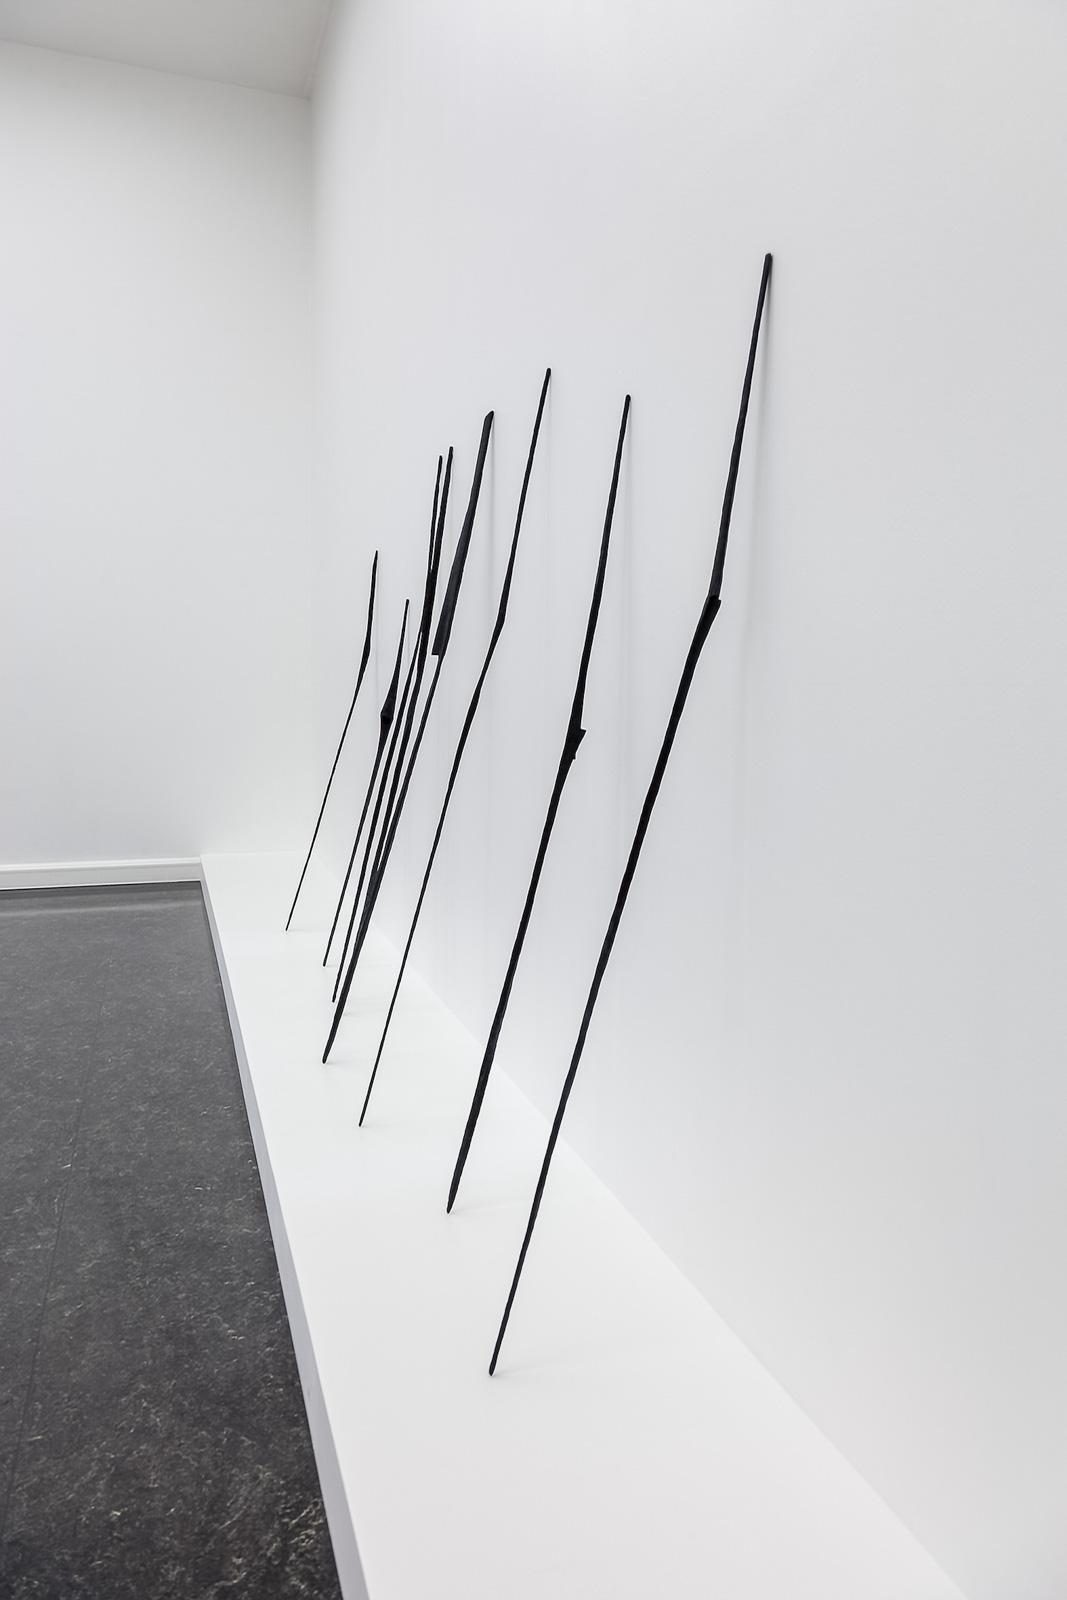 Installation view, Festspillutstillingen 2017, Bergen Kunsthall; The Bundle, 2017, 7 individual bronze sculptures, overall installed dimensions 199 x 333 cm